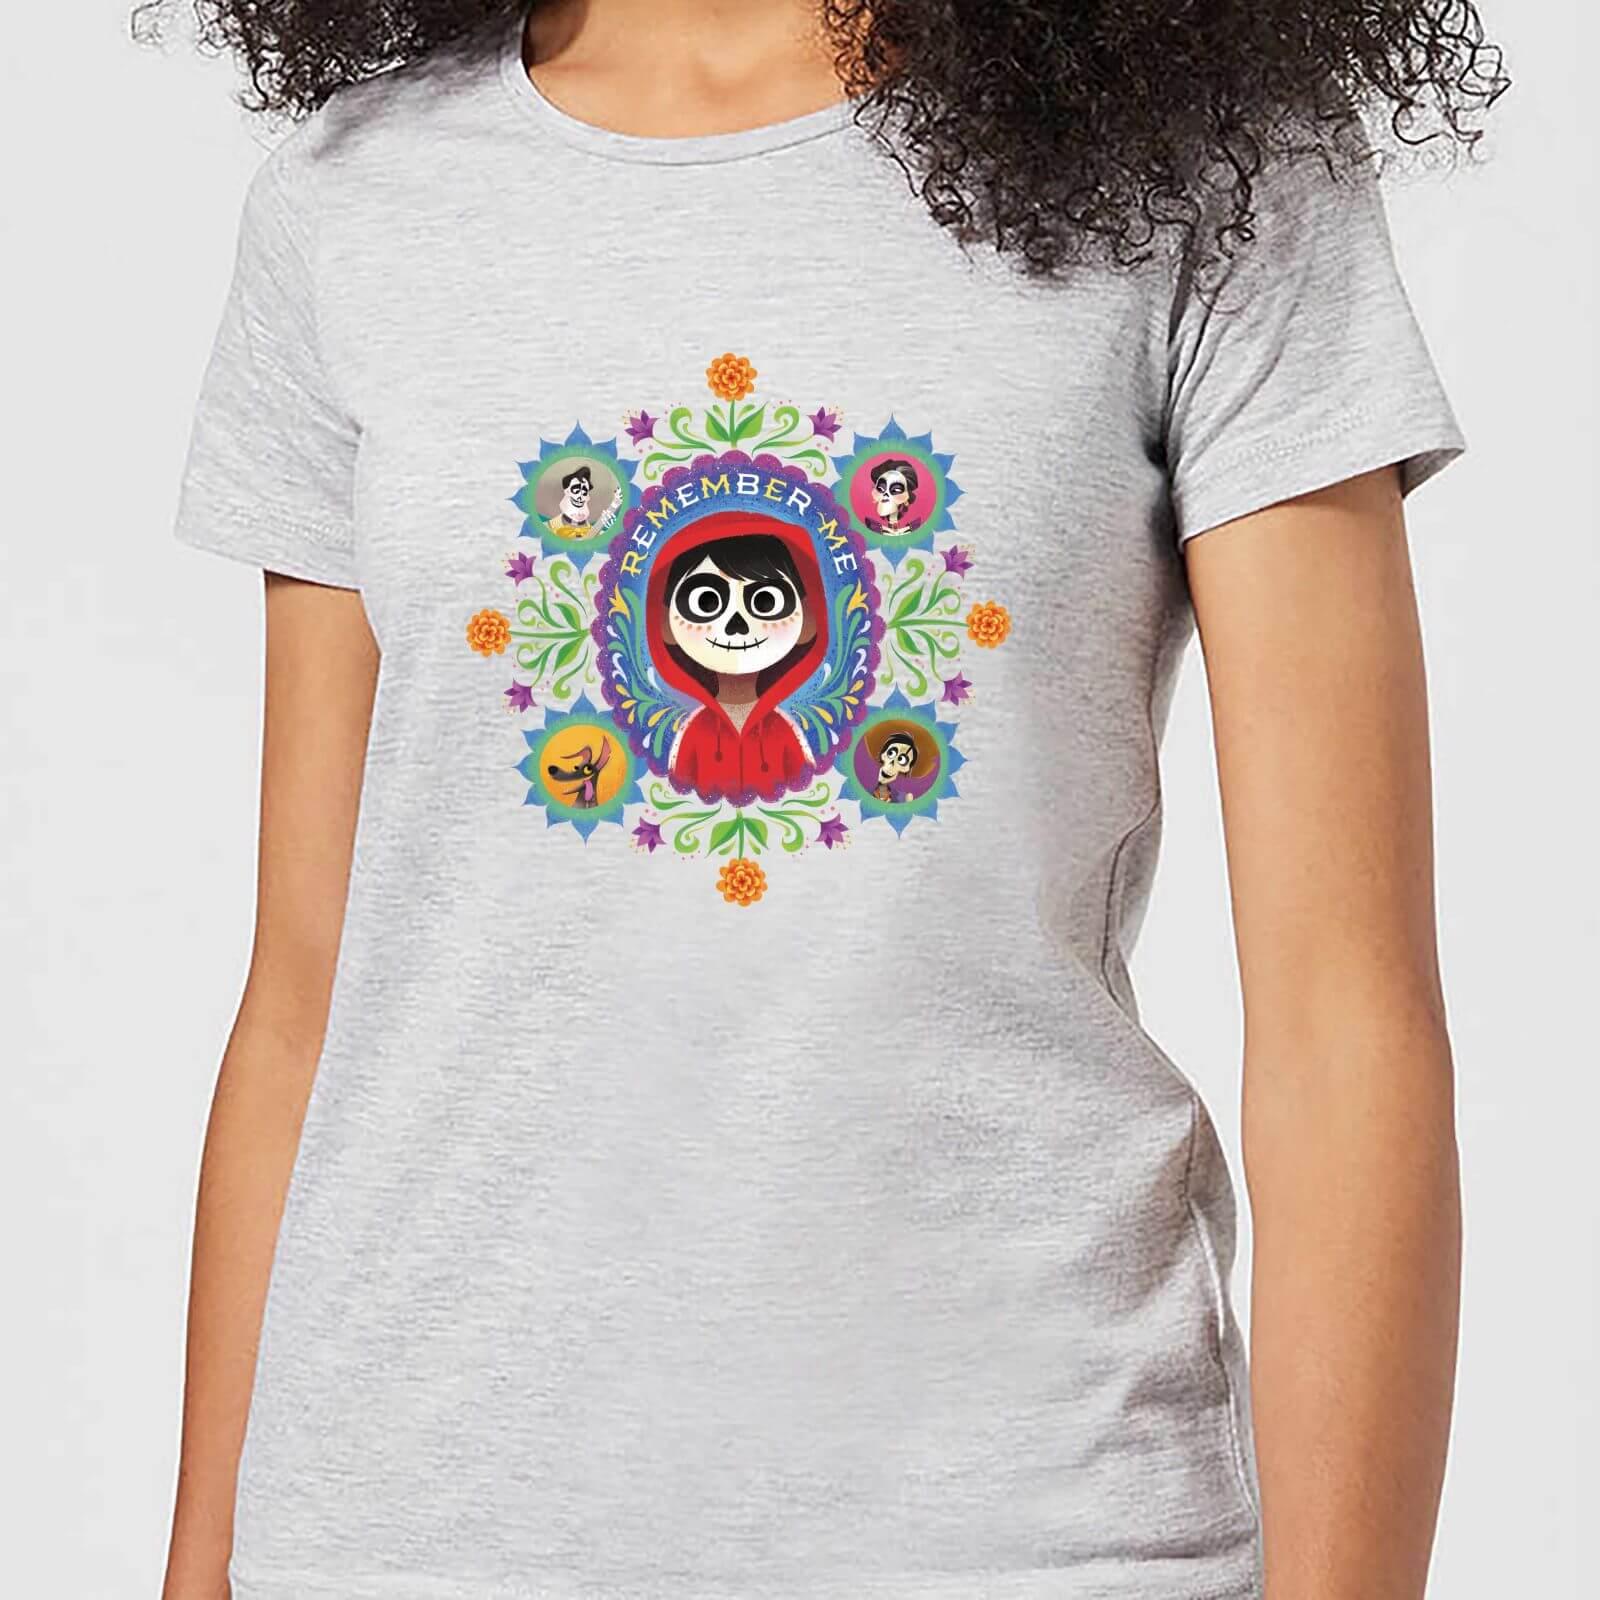 Disney Coco Remember Me Women's T-Shirt - Grey - M - Grey